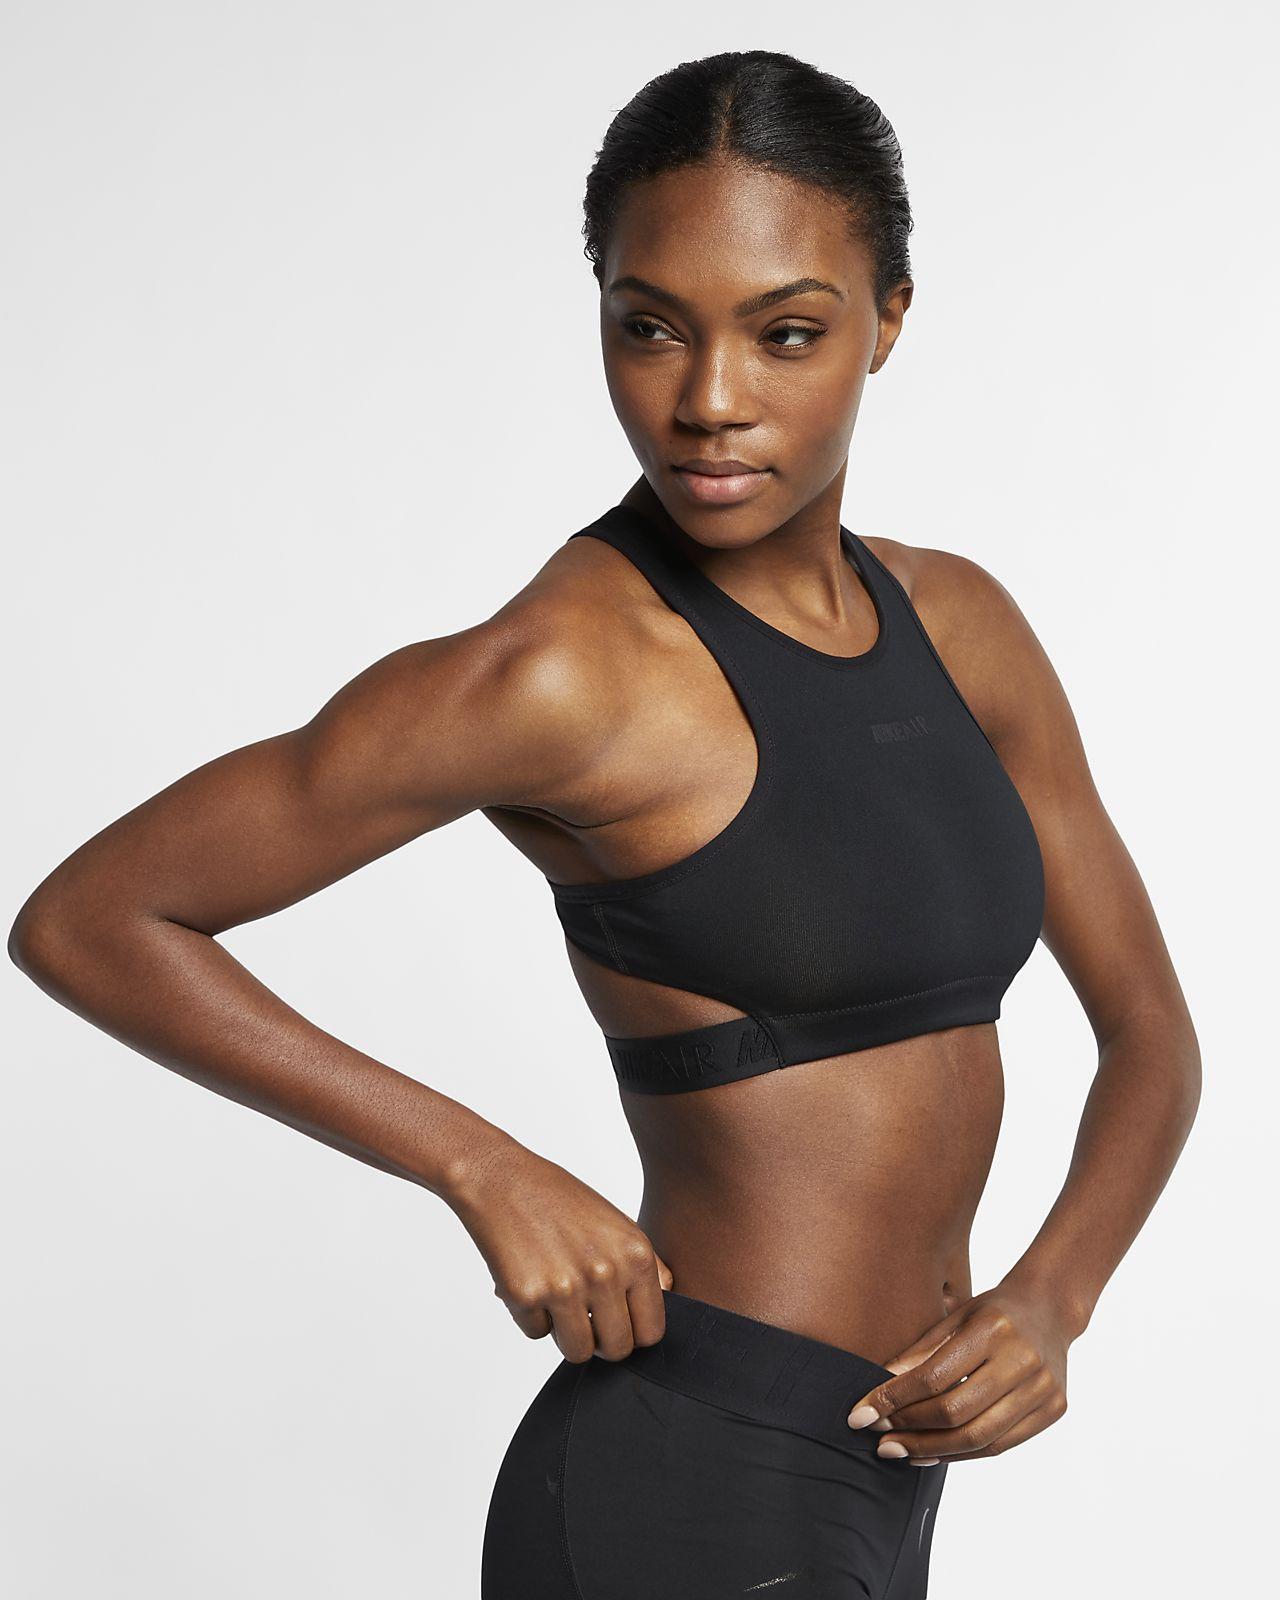 07a66dfe2a796 Nike Women s Medium Support Sports Bra. Nike.com GB